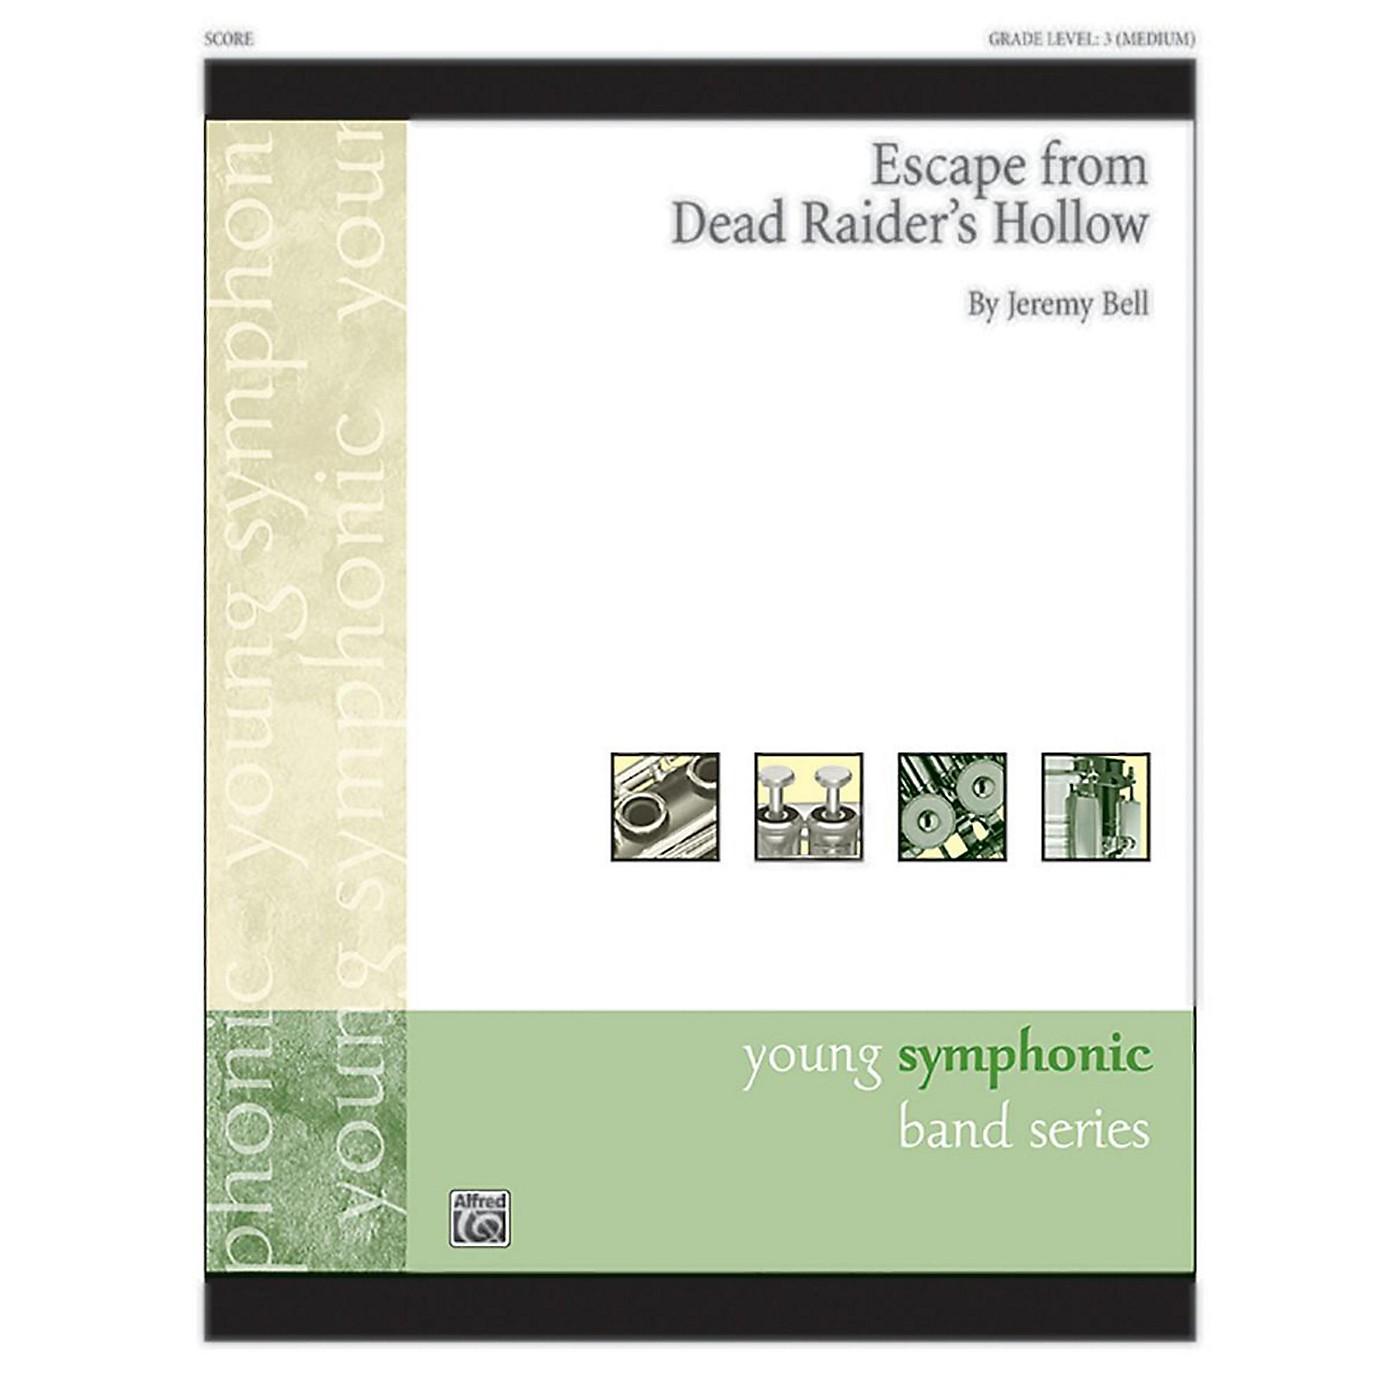 Alfred Escape from Dead Raider's Hollow - Grade 3 (Medium) thumbnail